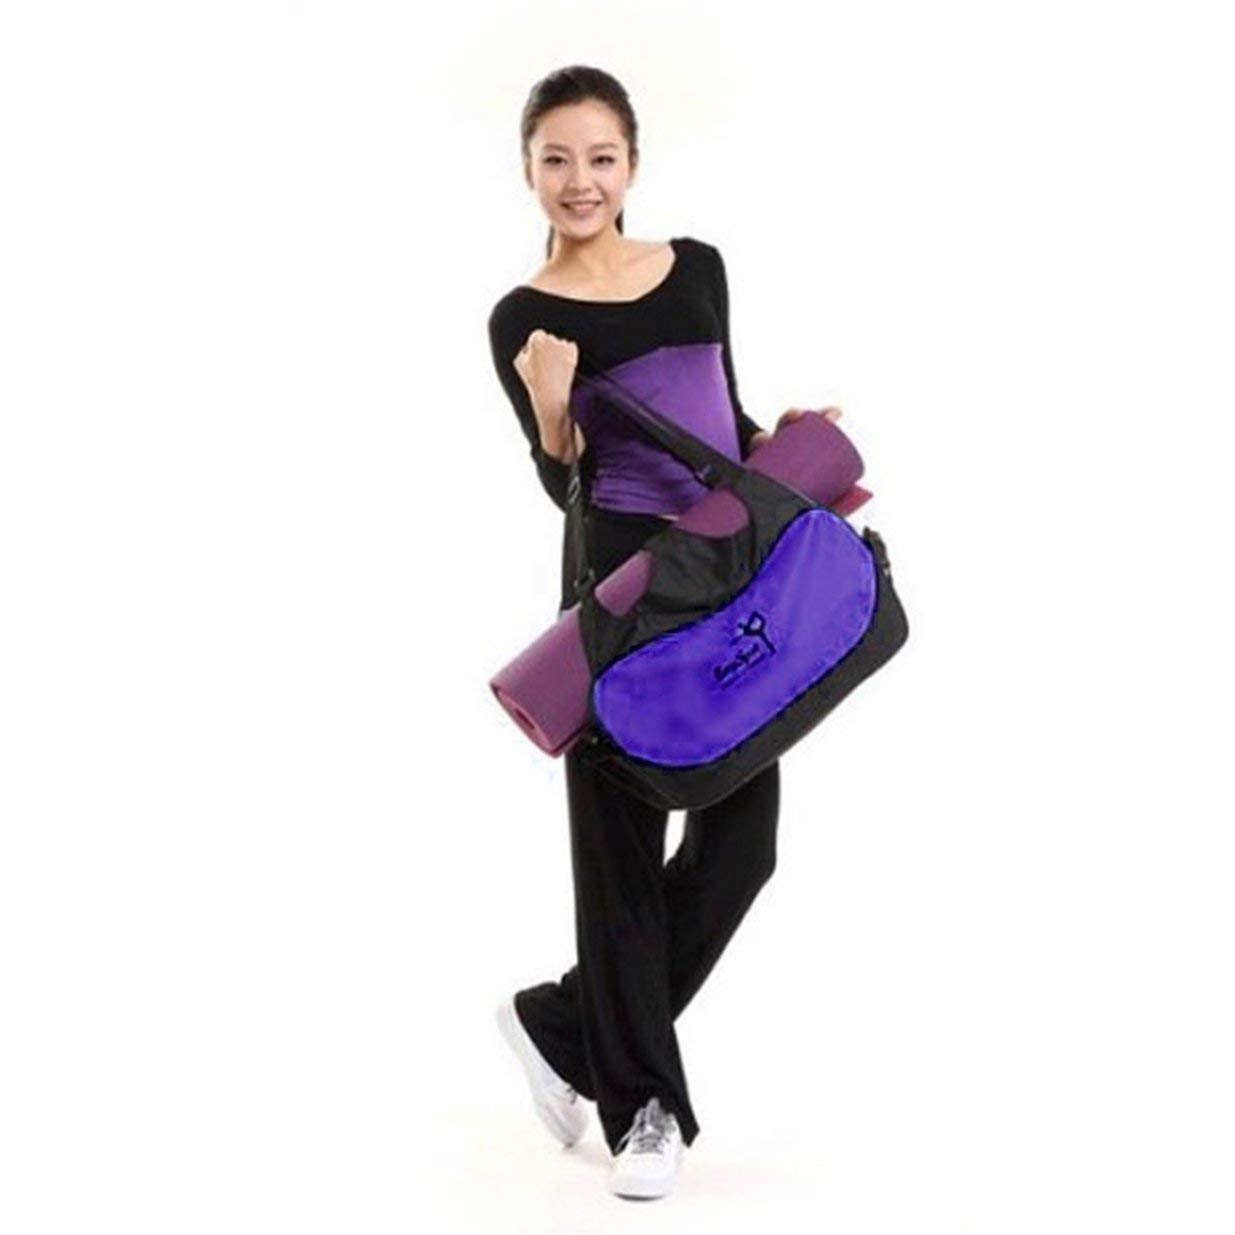 Banbie Multifuncional Impermeable Oxford Tela Yoga Gimnasio Pilates Mat Bolsa de Almacenamiento Mochila Ropa de Gran Capacidad Portadores de Bolsas Deportivas